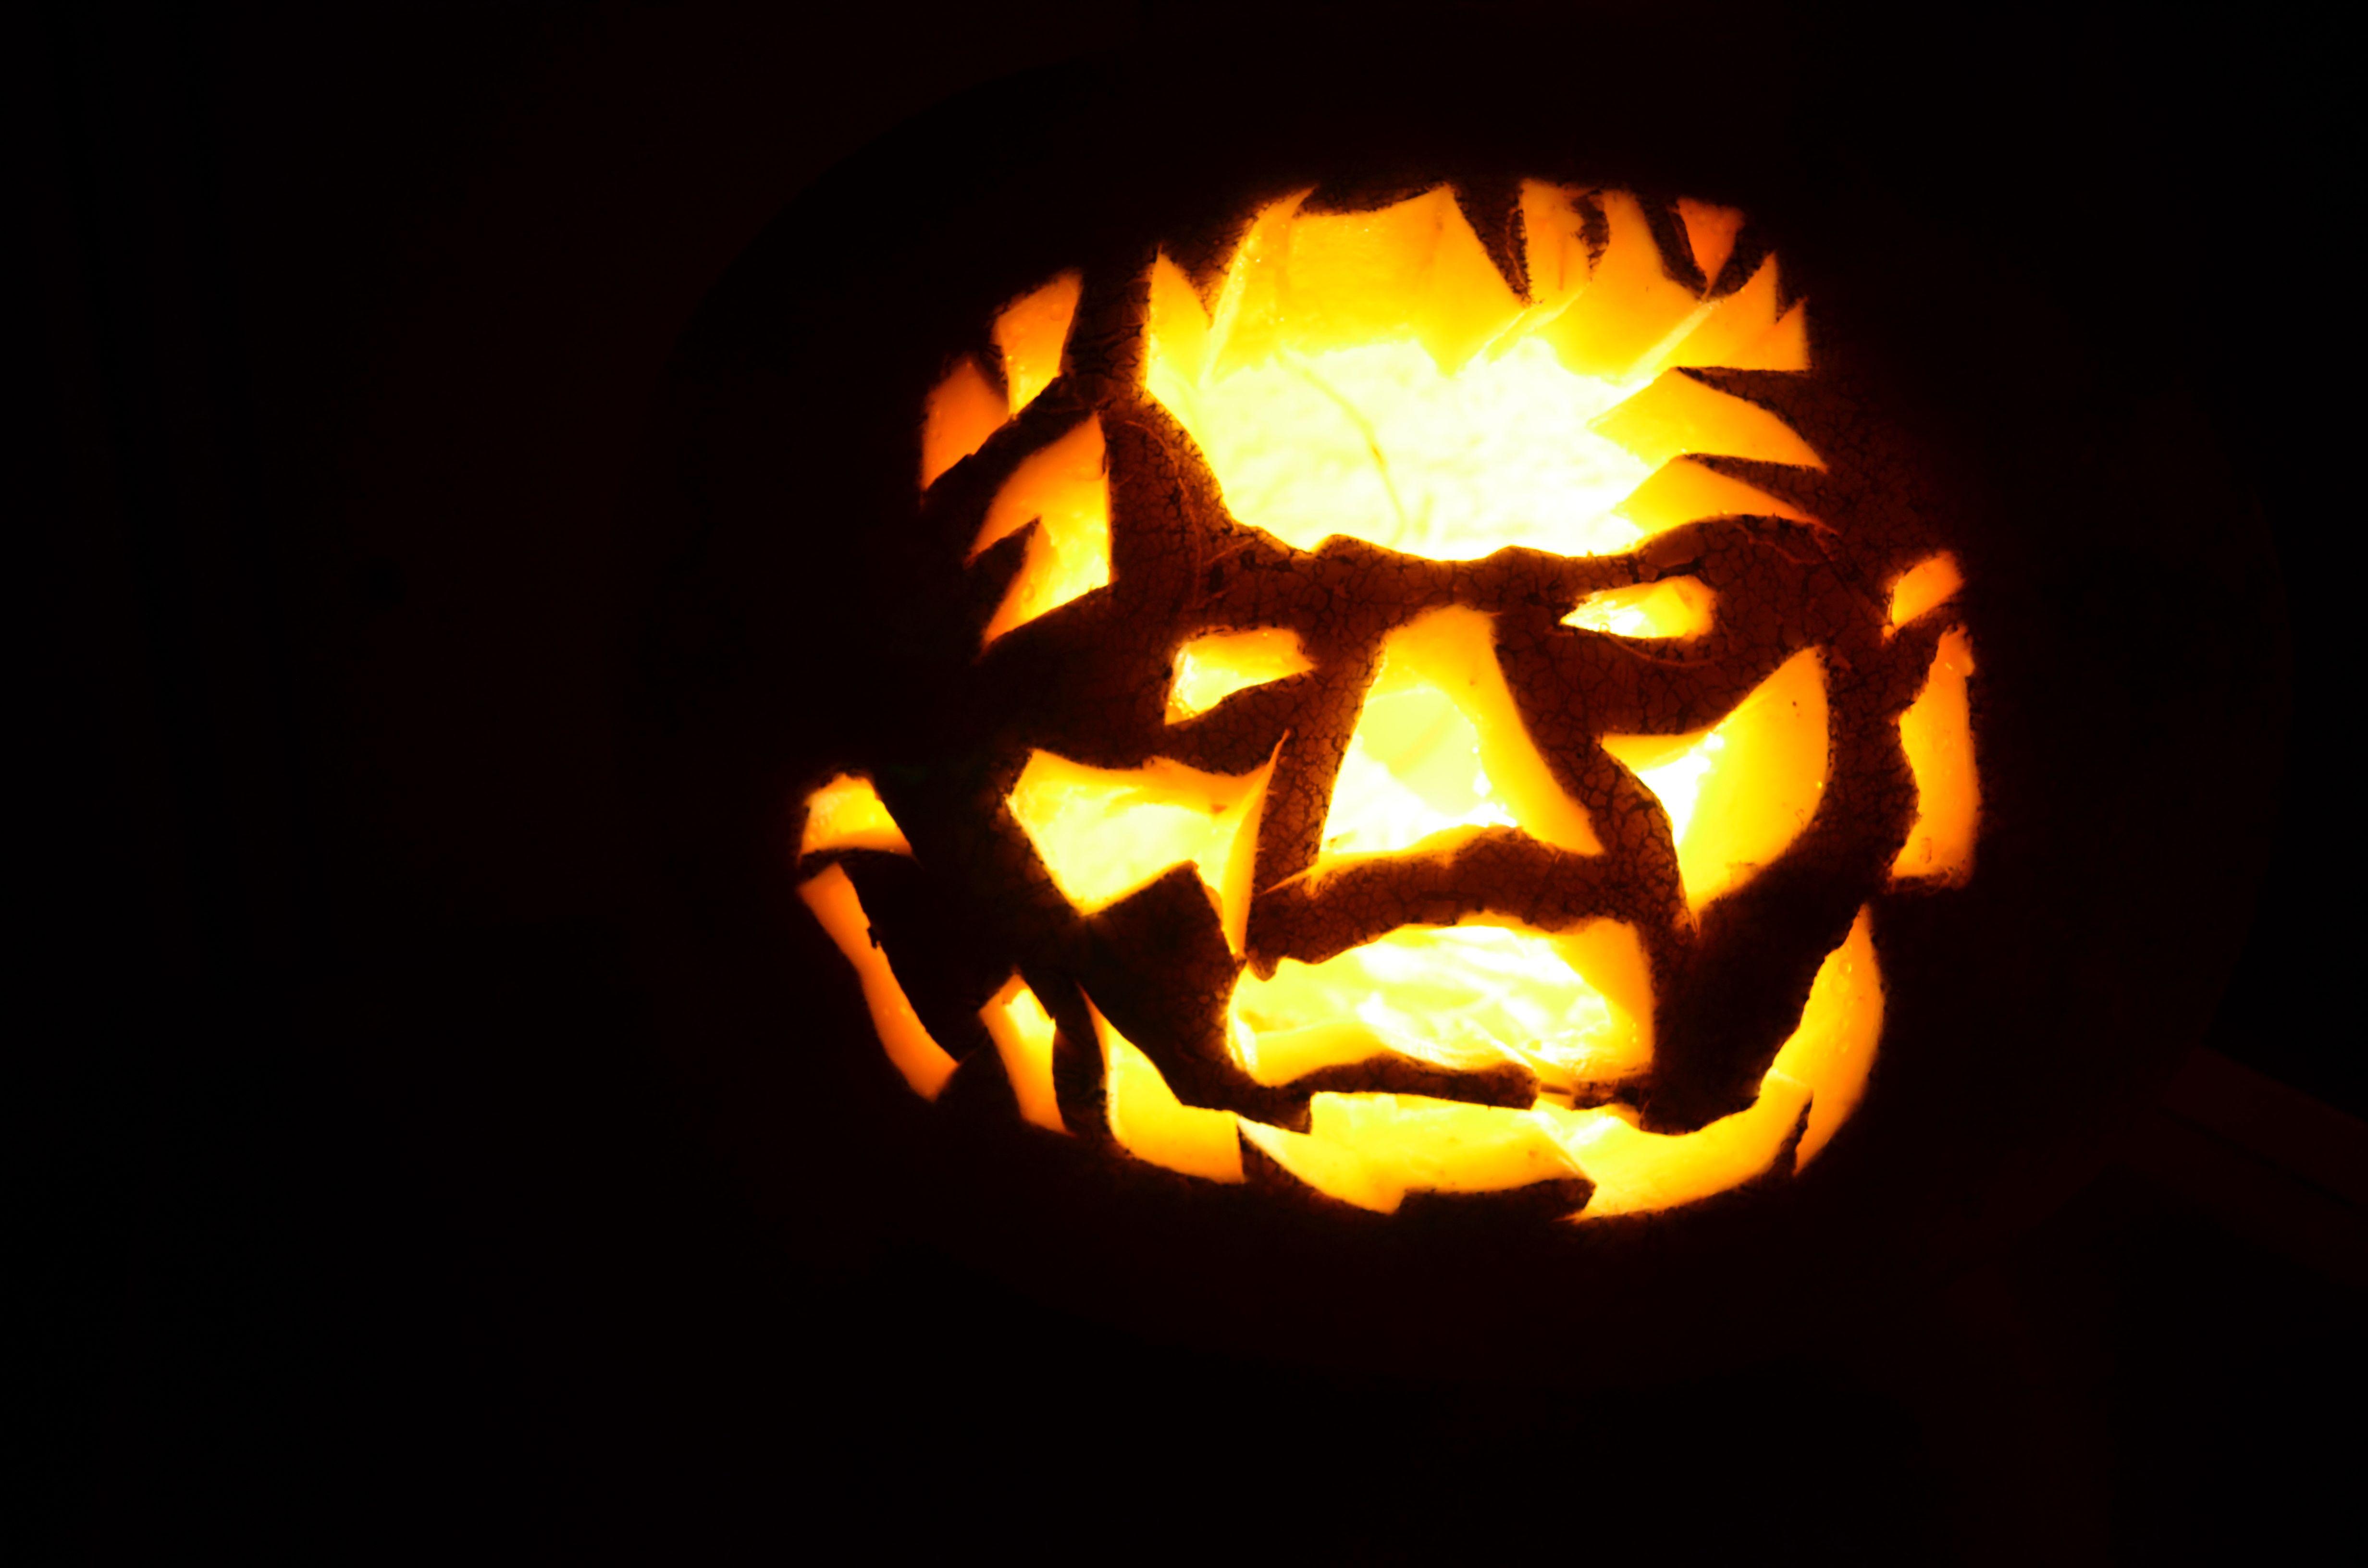 Pumpkin Carving | EVE ESTUARY